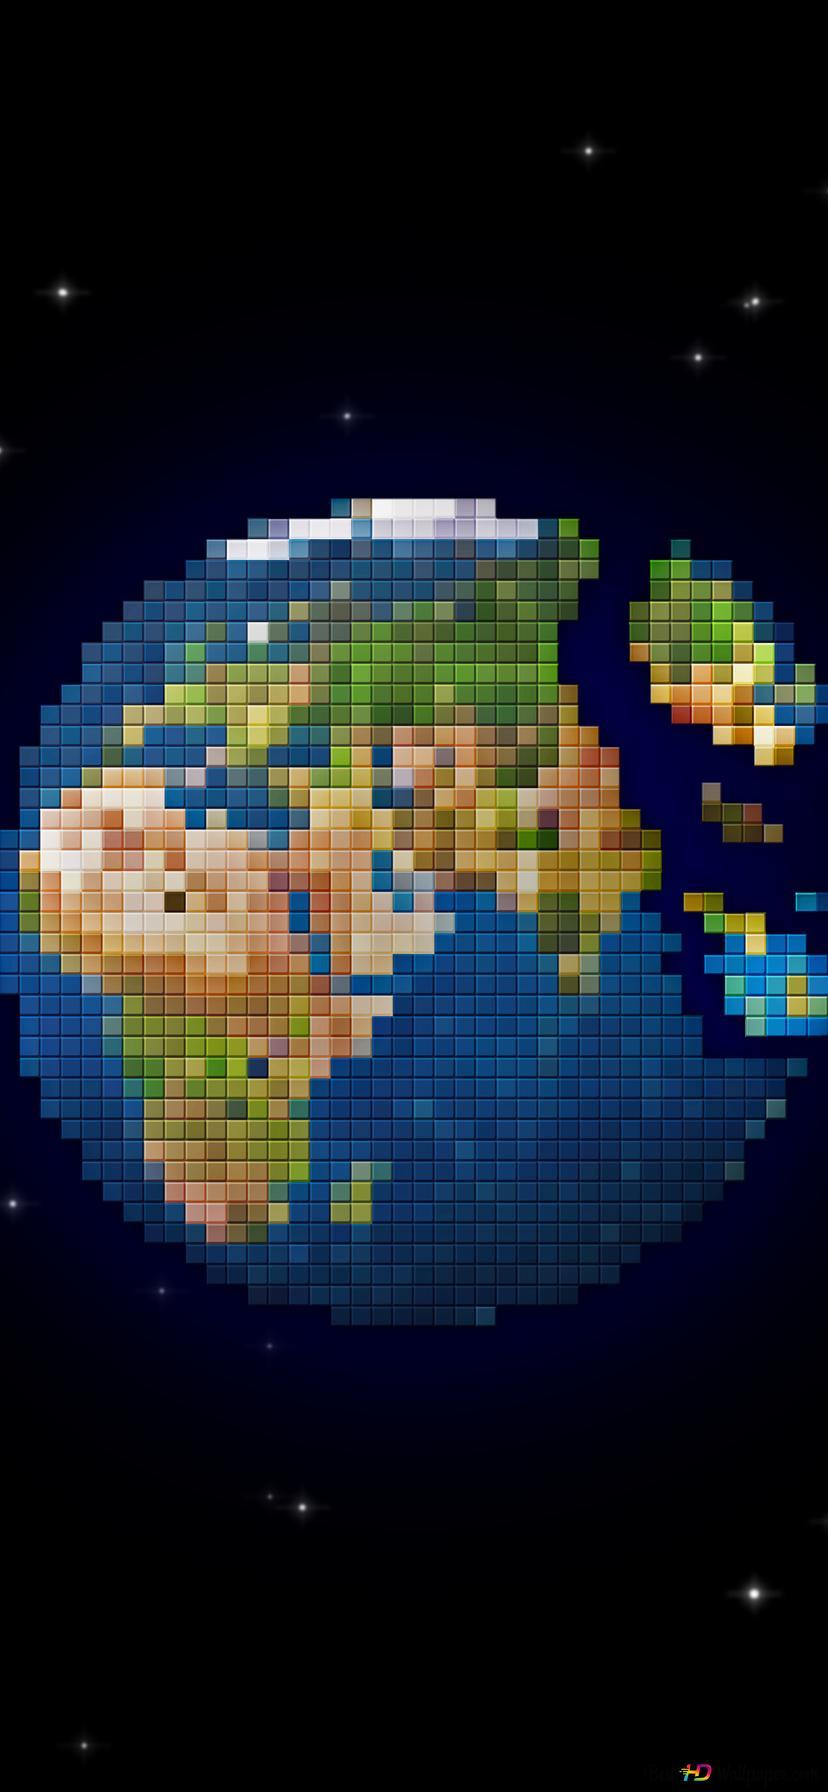 pixelated earth wallpaper 828x1792 29933 218